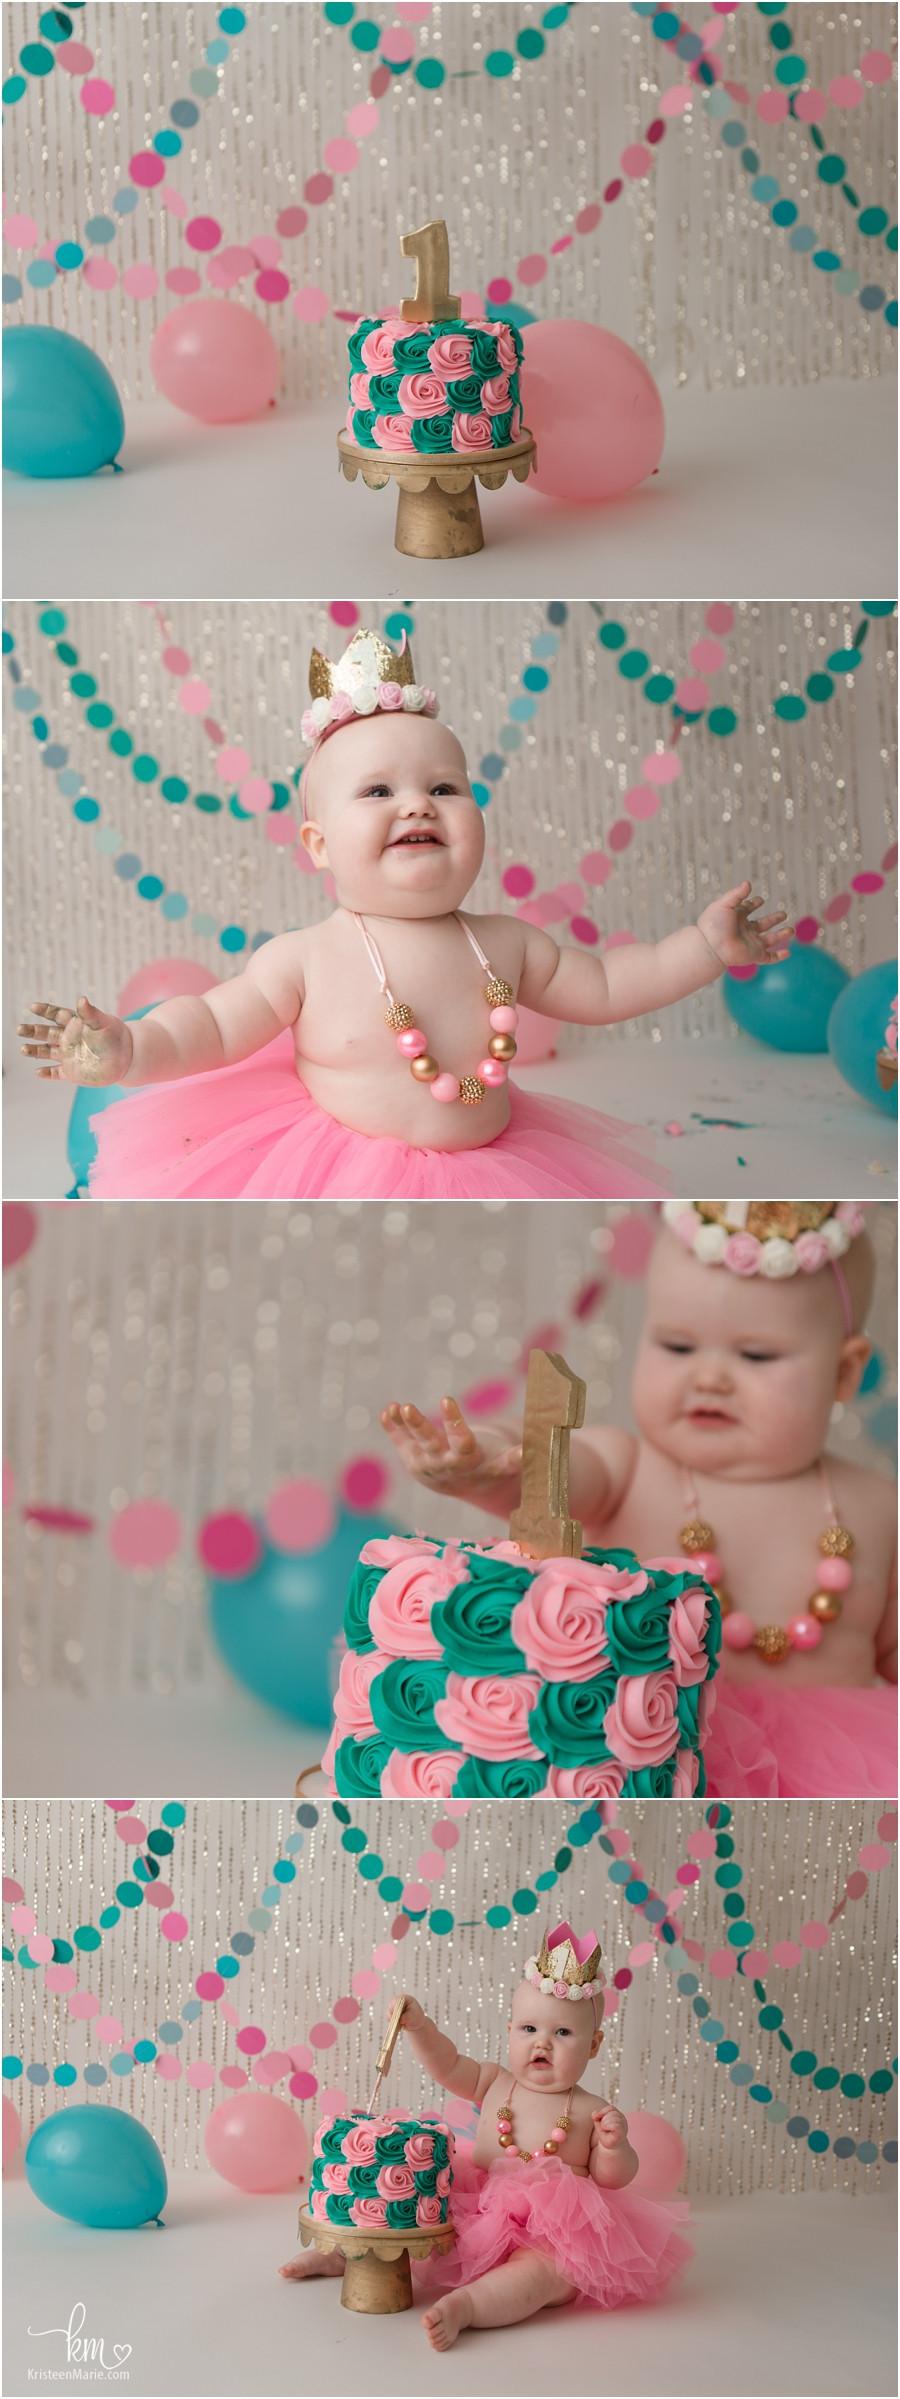 Birthday Smash Cake  Cake Smash & First Birthday graphy